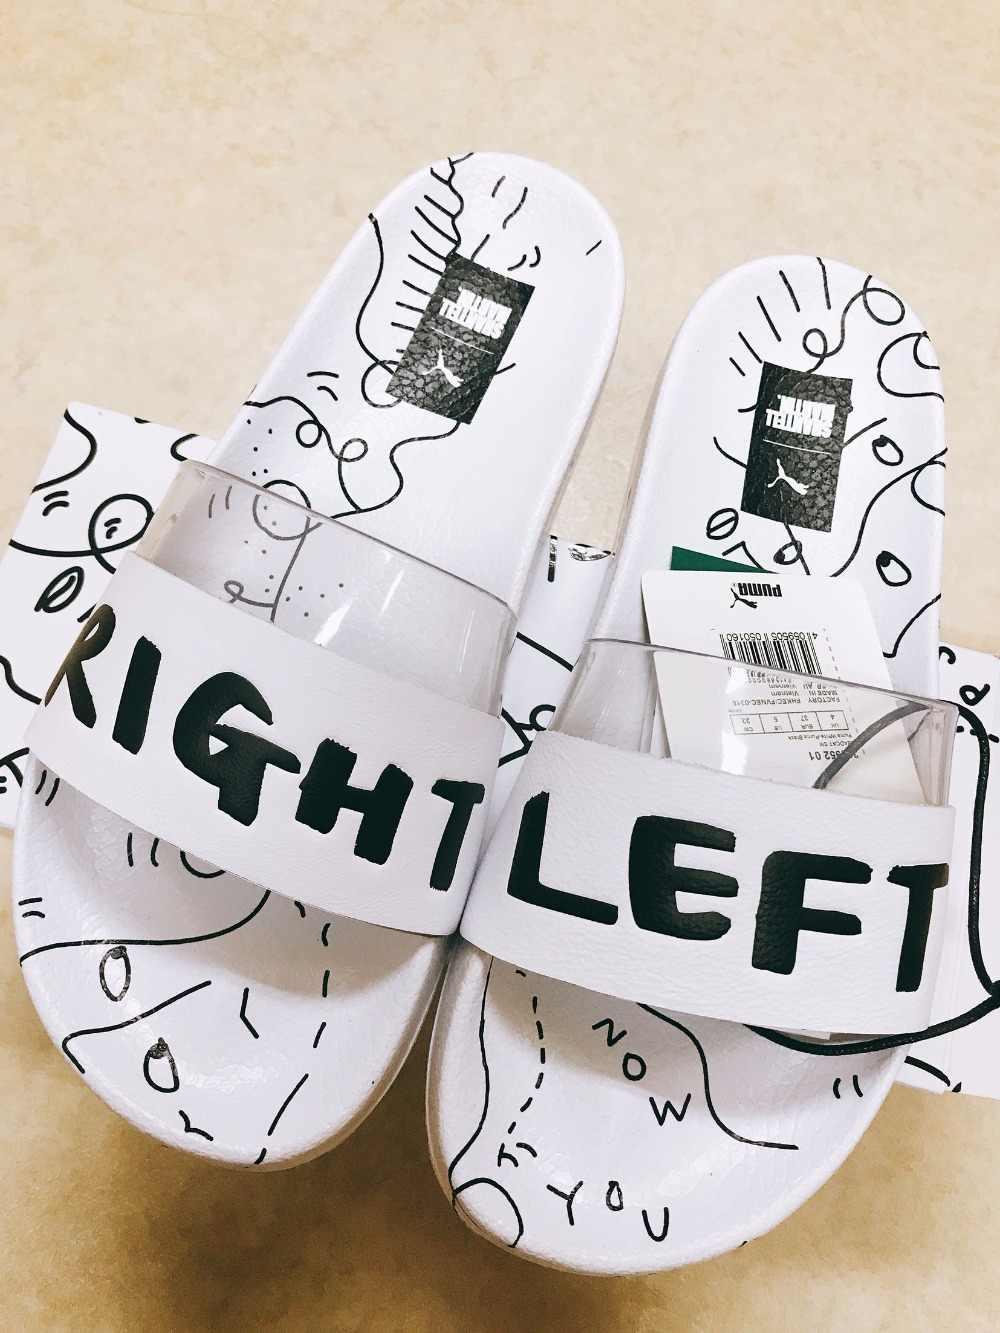 d18f75b3fb2e PUMA X SHANTELL MARTIN Clyde Puma black and white joint graffiti  transparent slippers Badminton shoes size